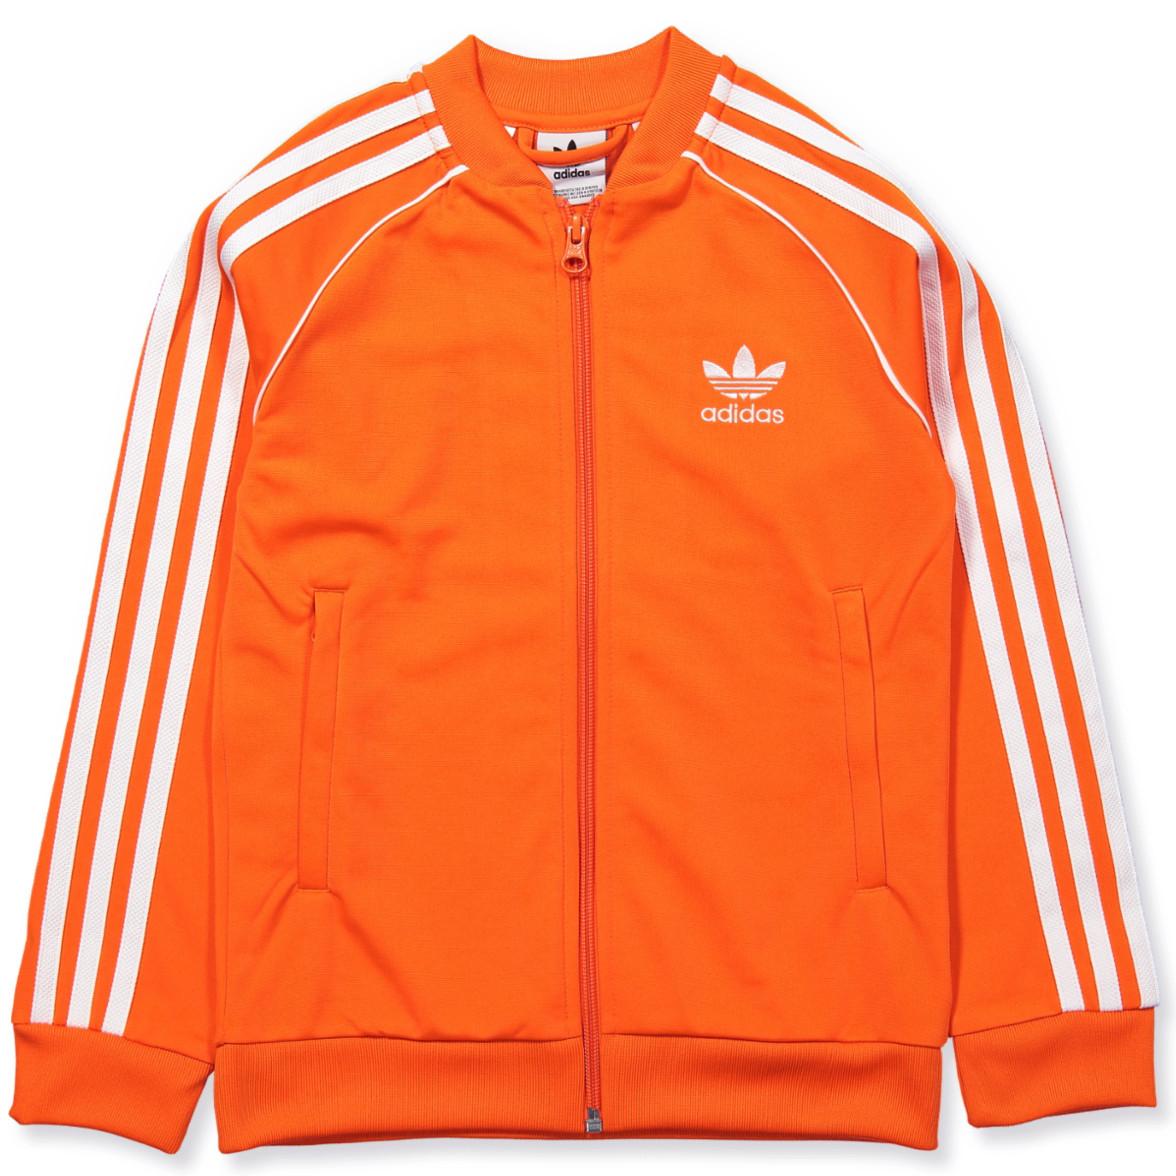 adidas spezial jacke orange